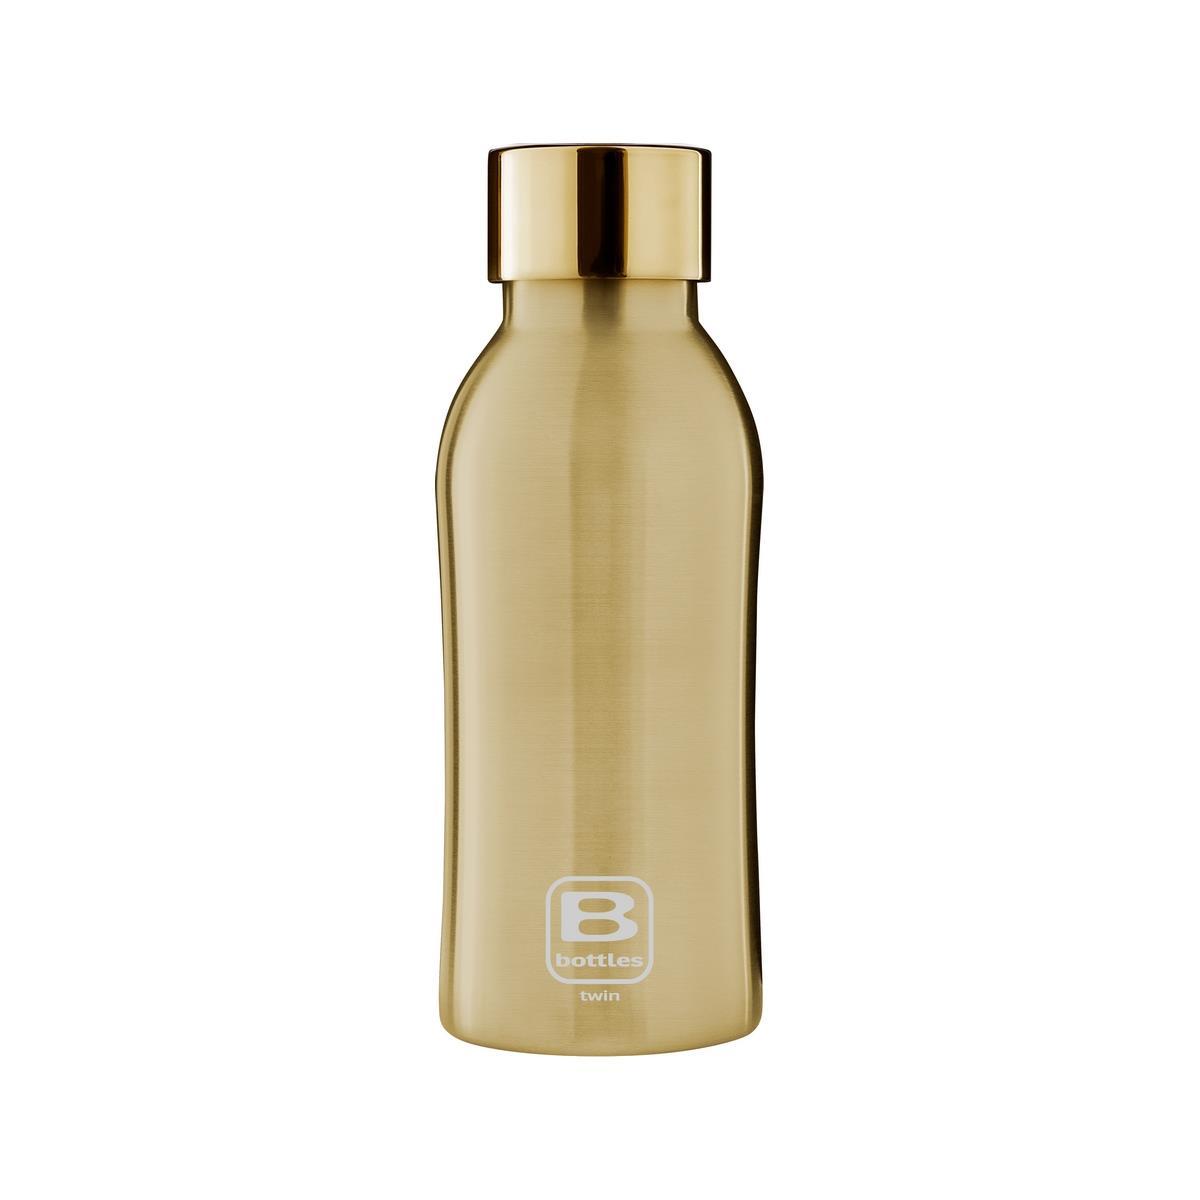 B Bottles Twin - Yellow Gold Brushed - 350 ml - Bottiglia Termica doppia parete in acc. inox 18/10